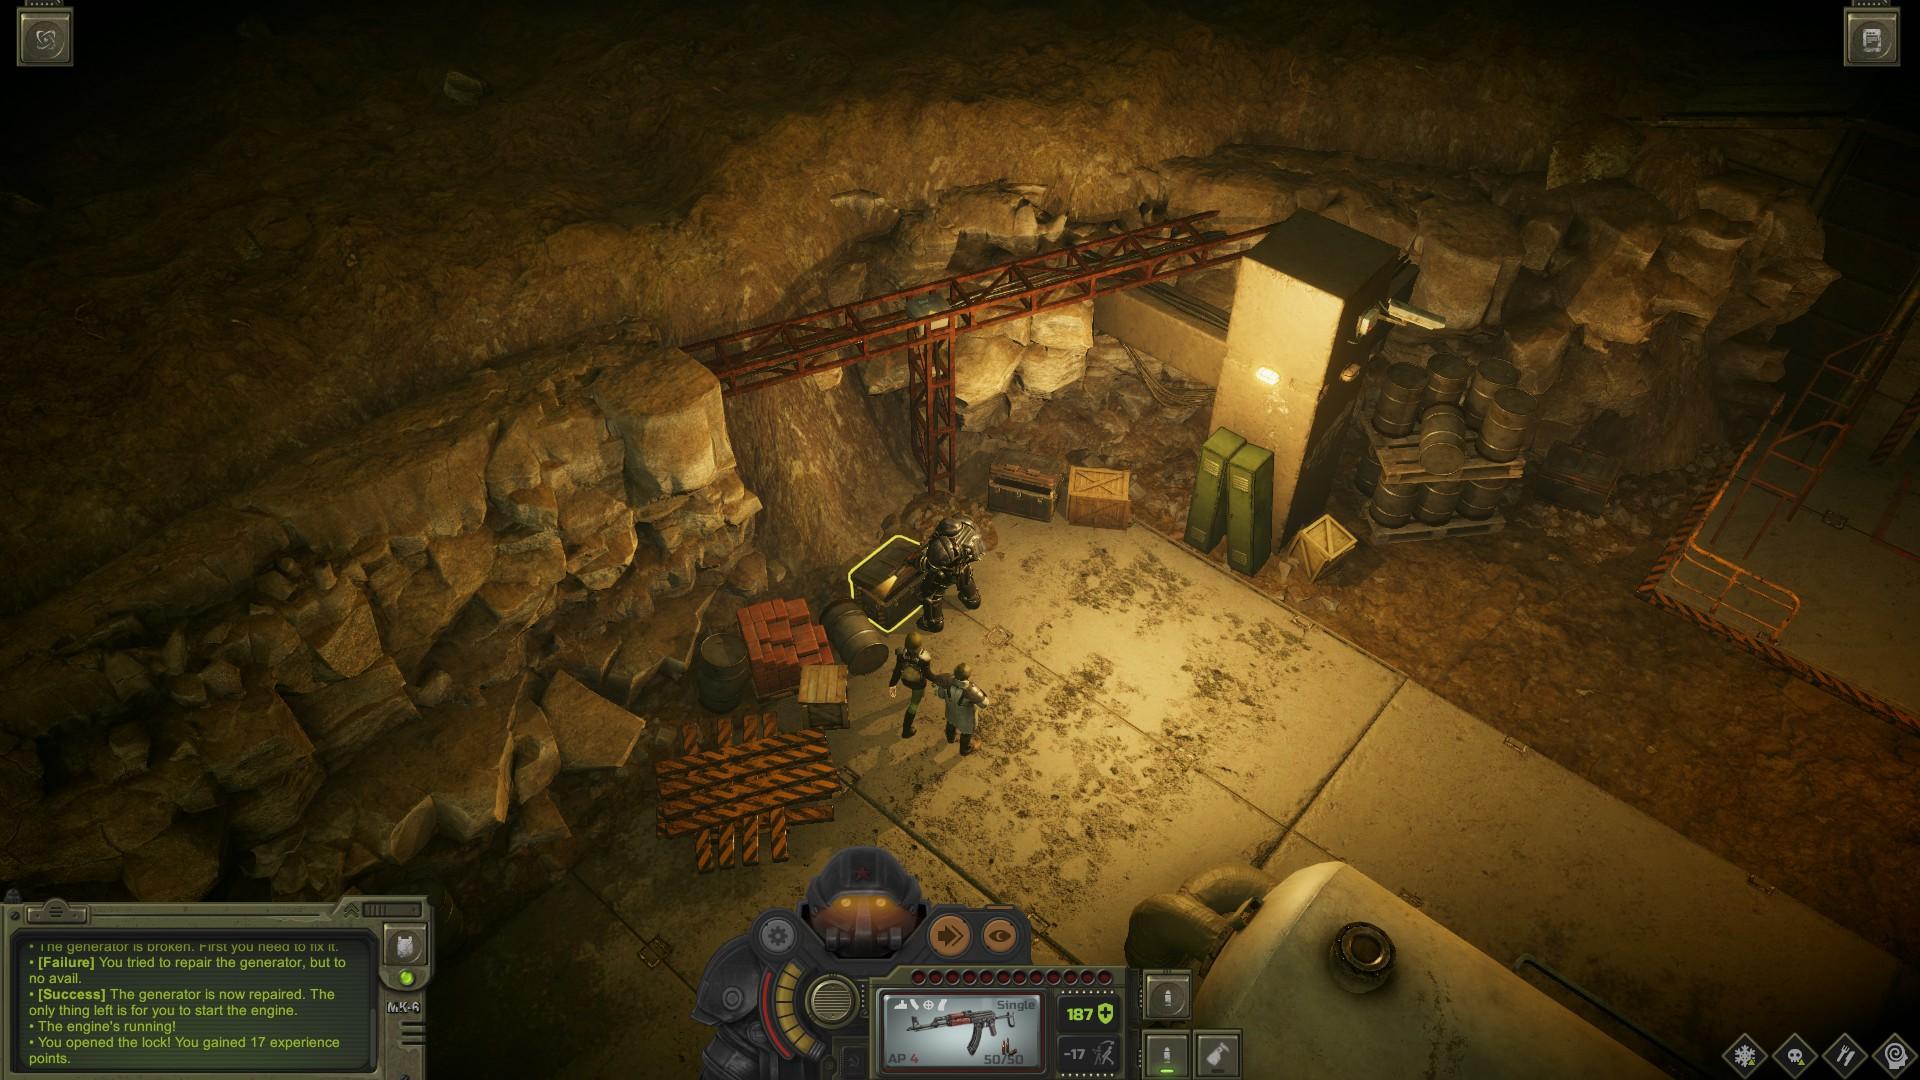 ATOM RPG Trudograd - Gameplay Tips & Walkthrough - Walkthrough Underground Test Site - 2E768DC